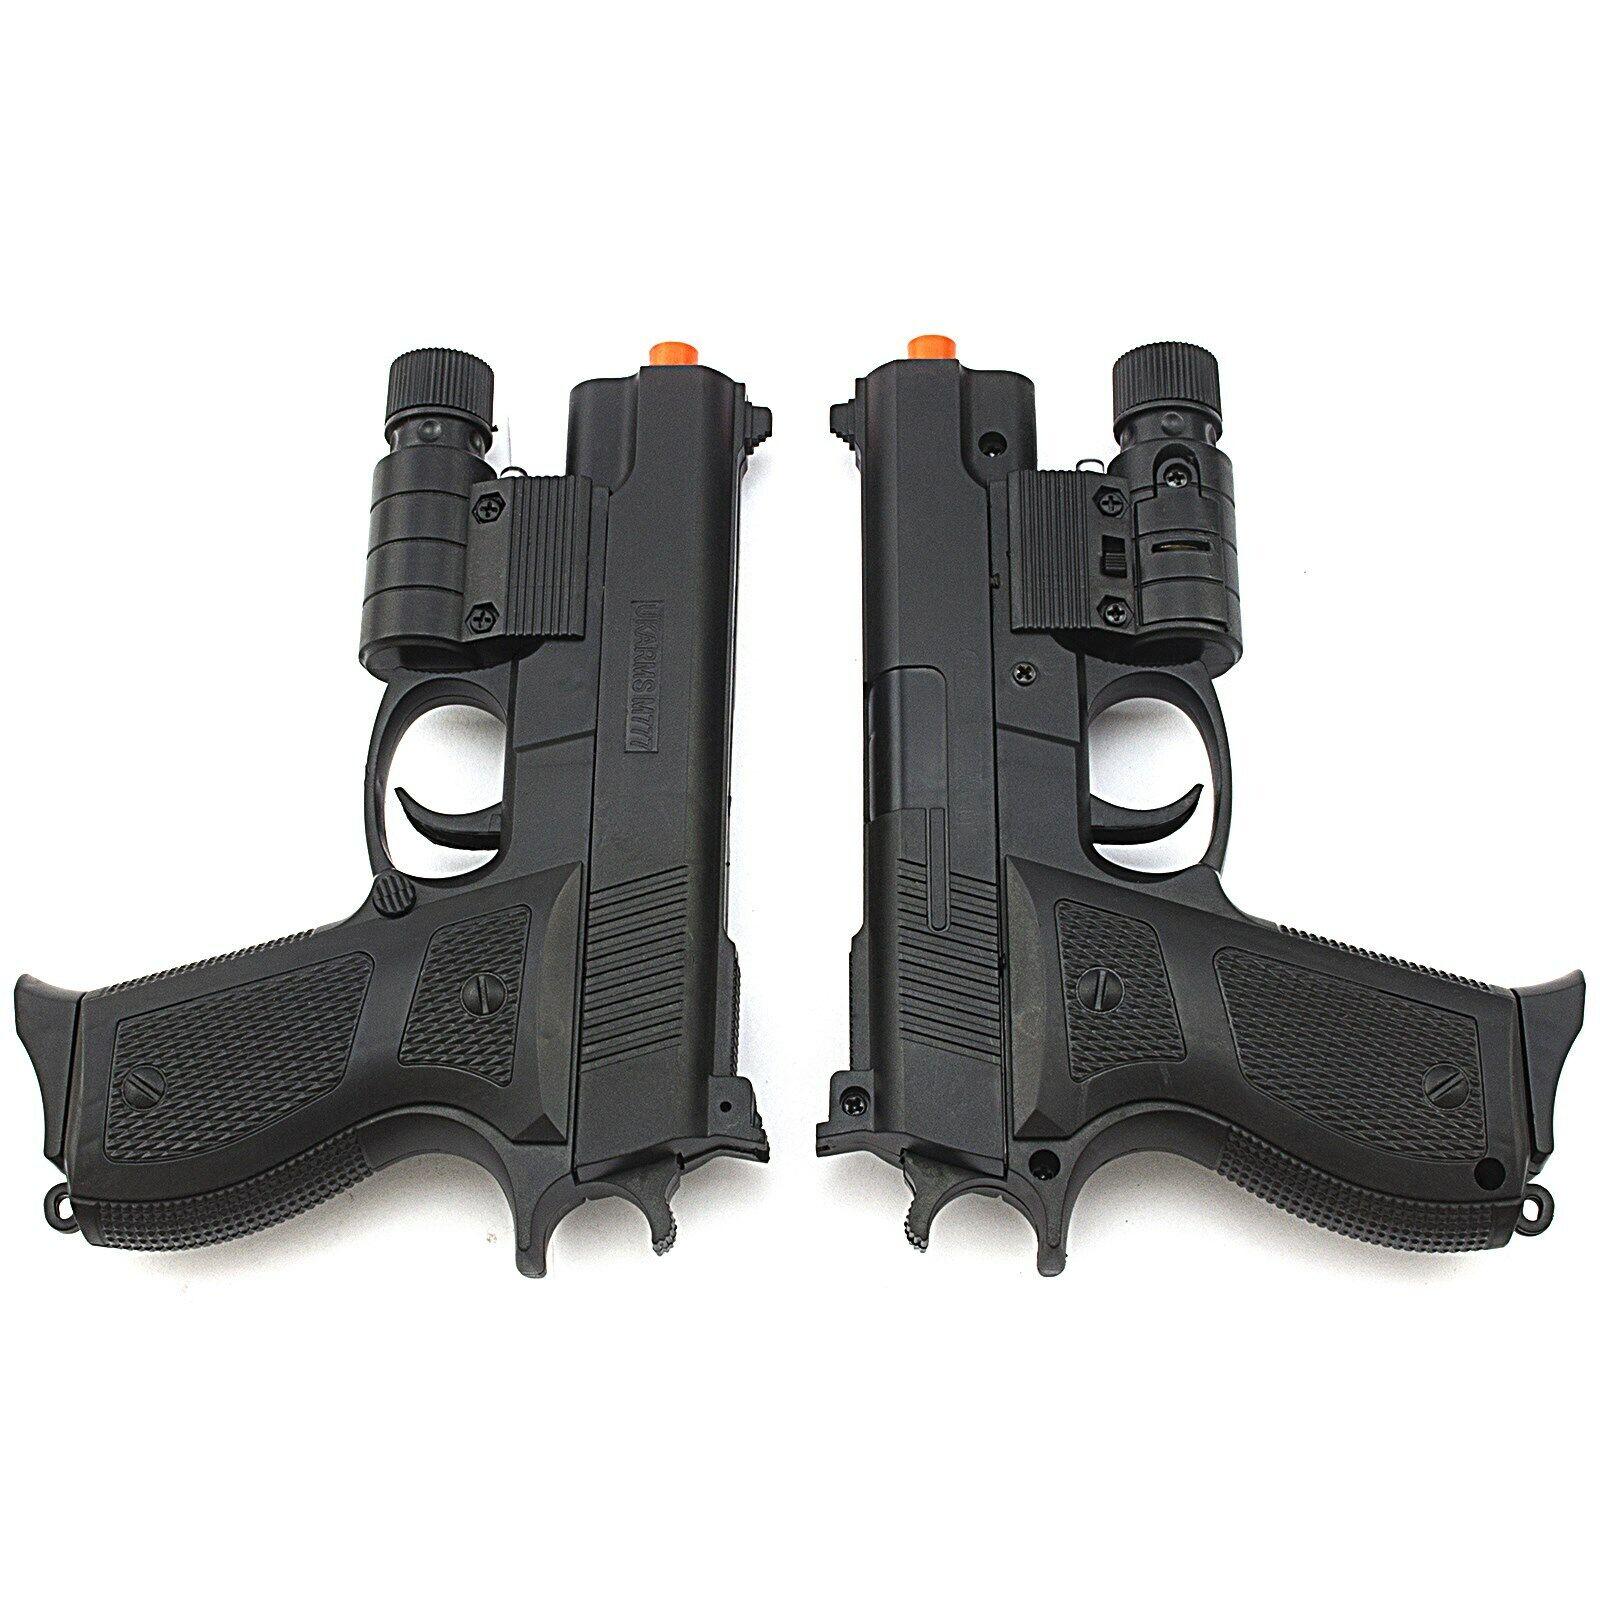 2 PC AIRSOFT TACTICAL SPRING PISTOL HAND GUN LASER SIGHT FLASHLIGHT 6mm BBs BB - $0.01